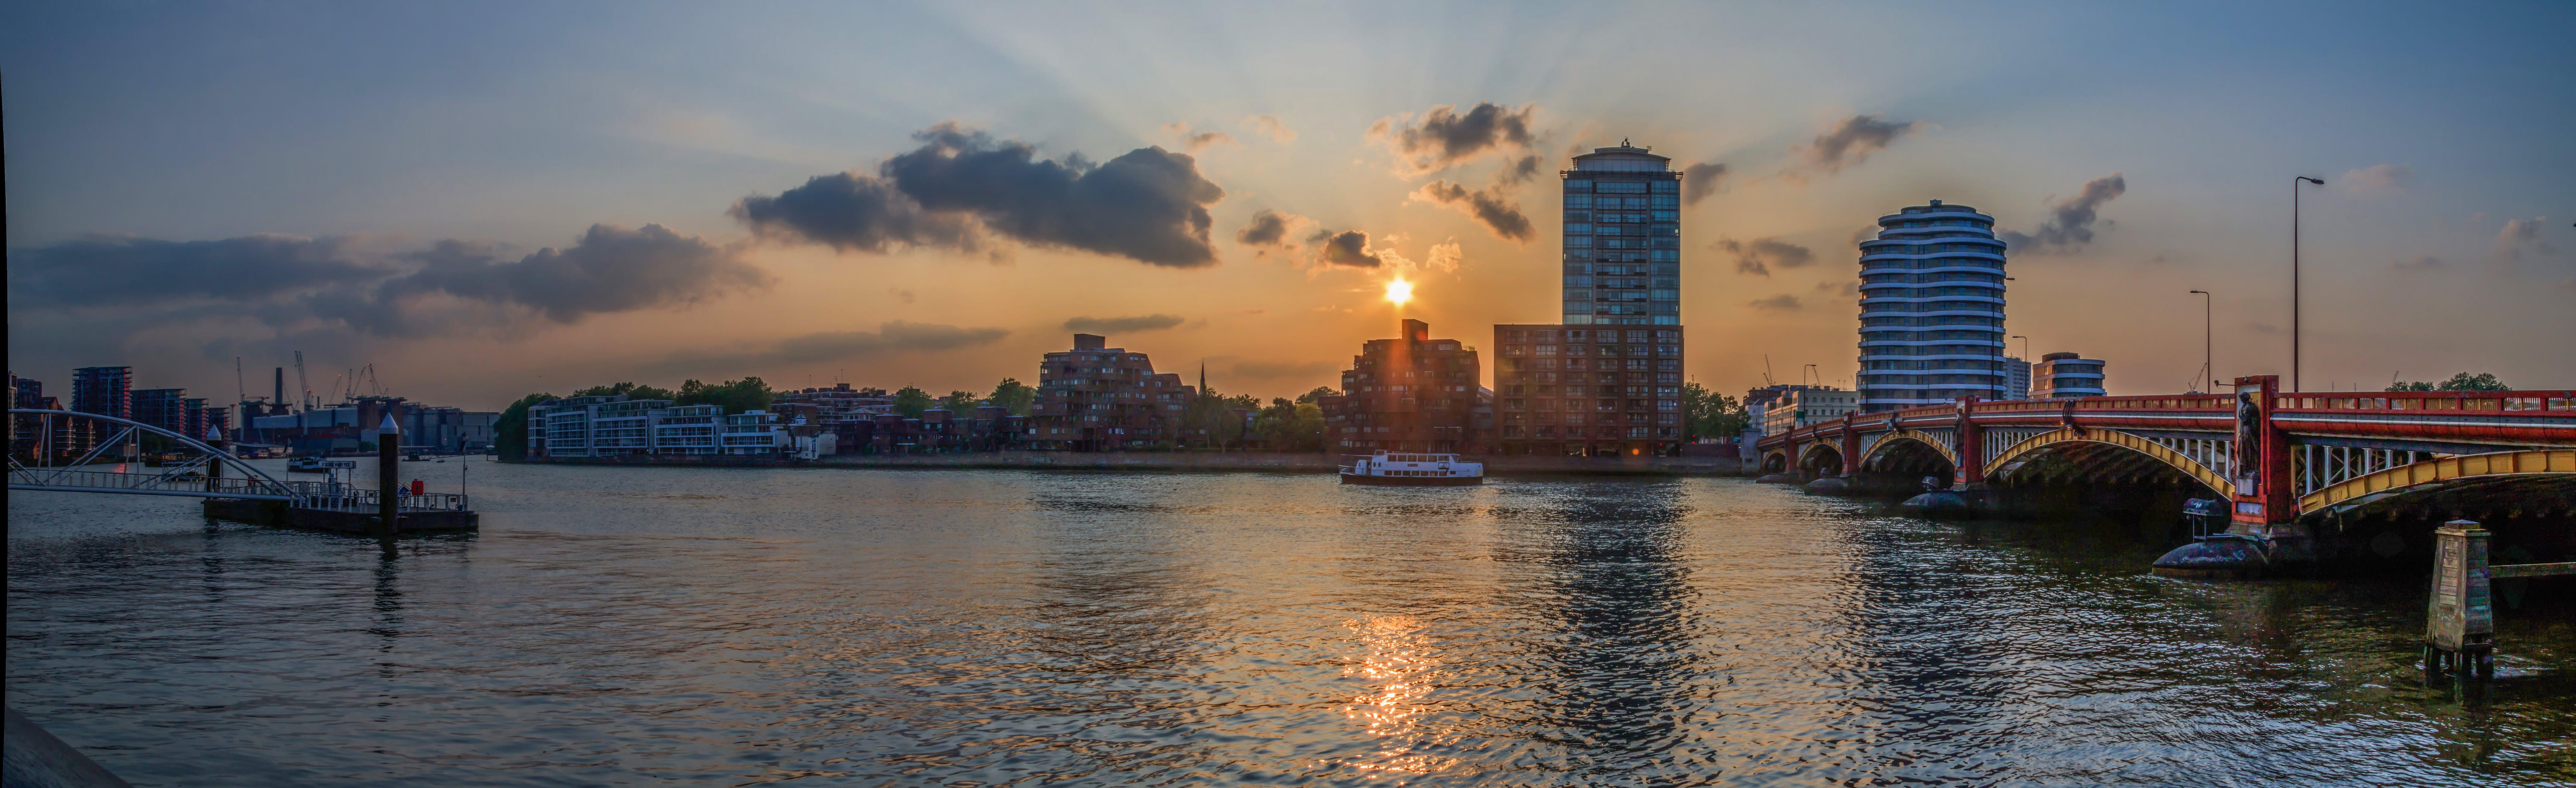 Free stock photo of city, sunset, landmark, night